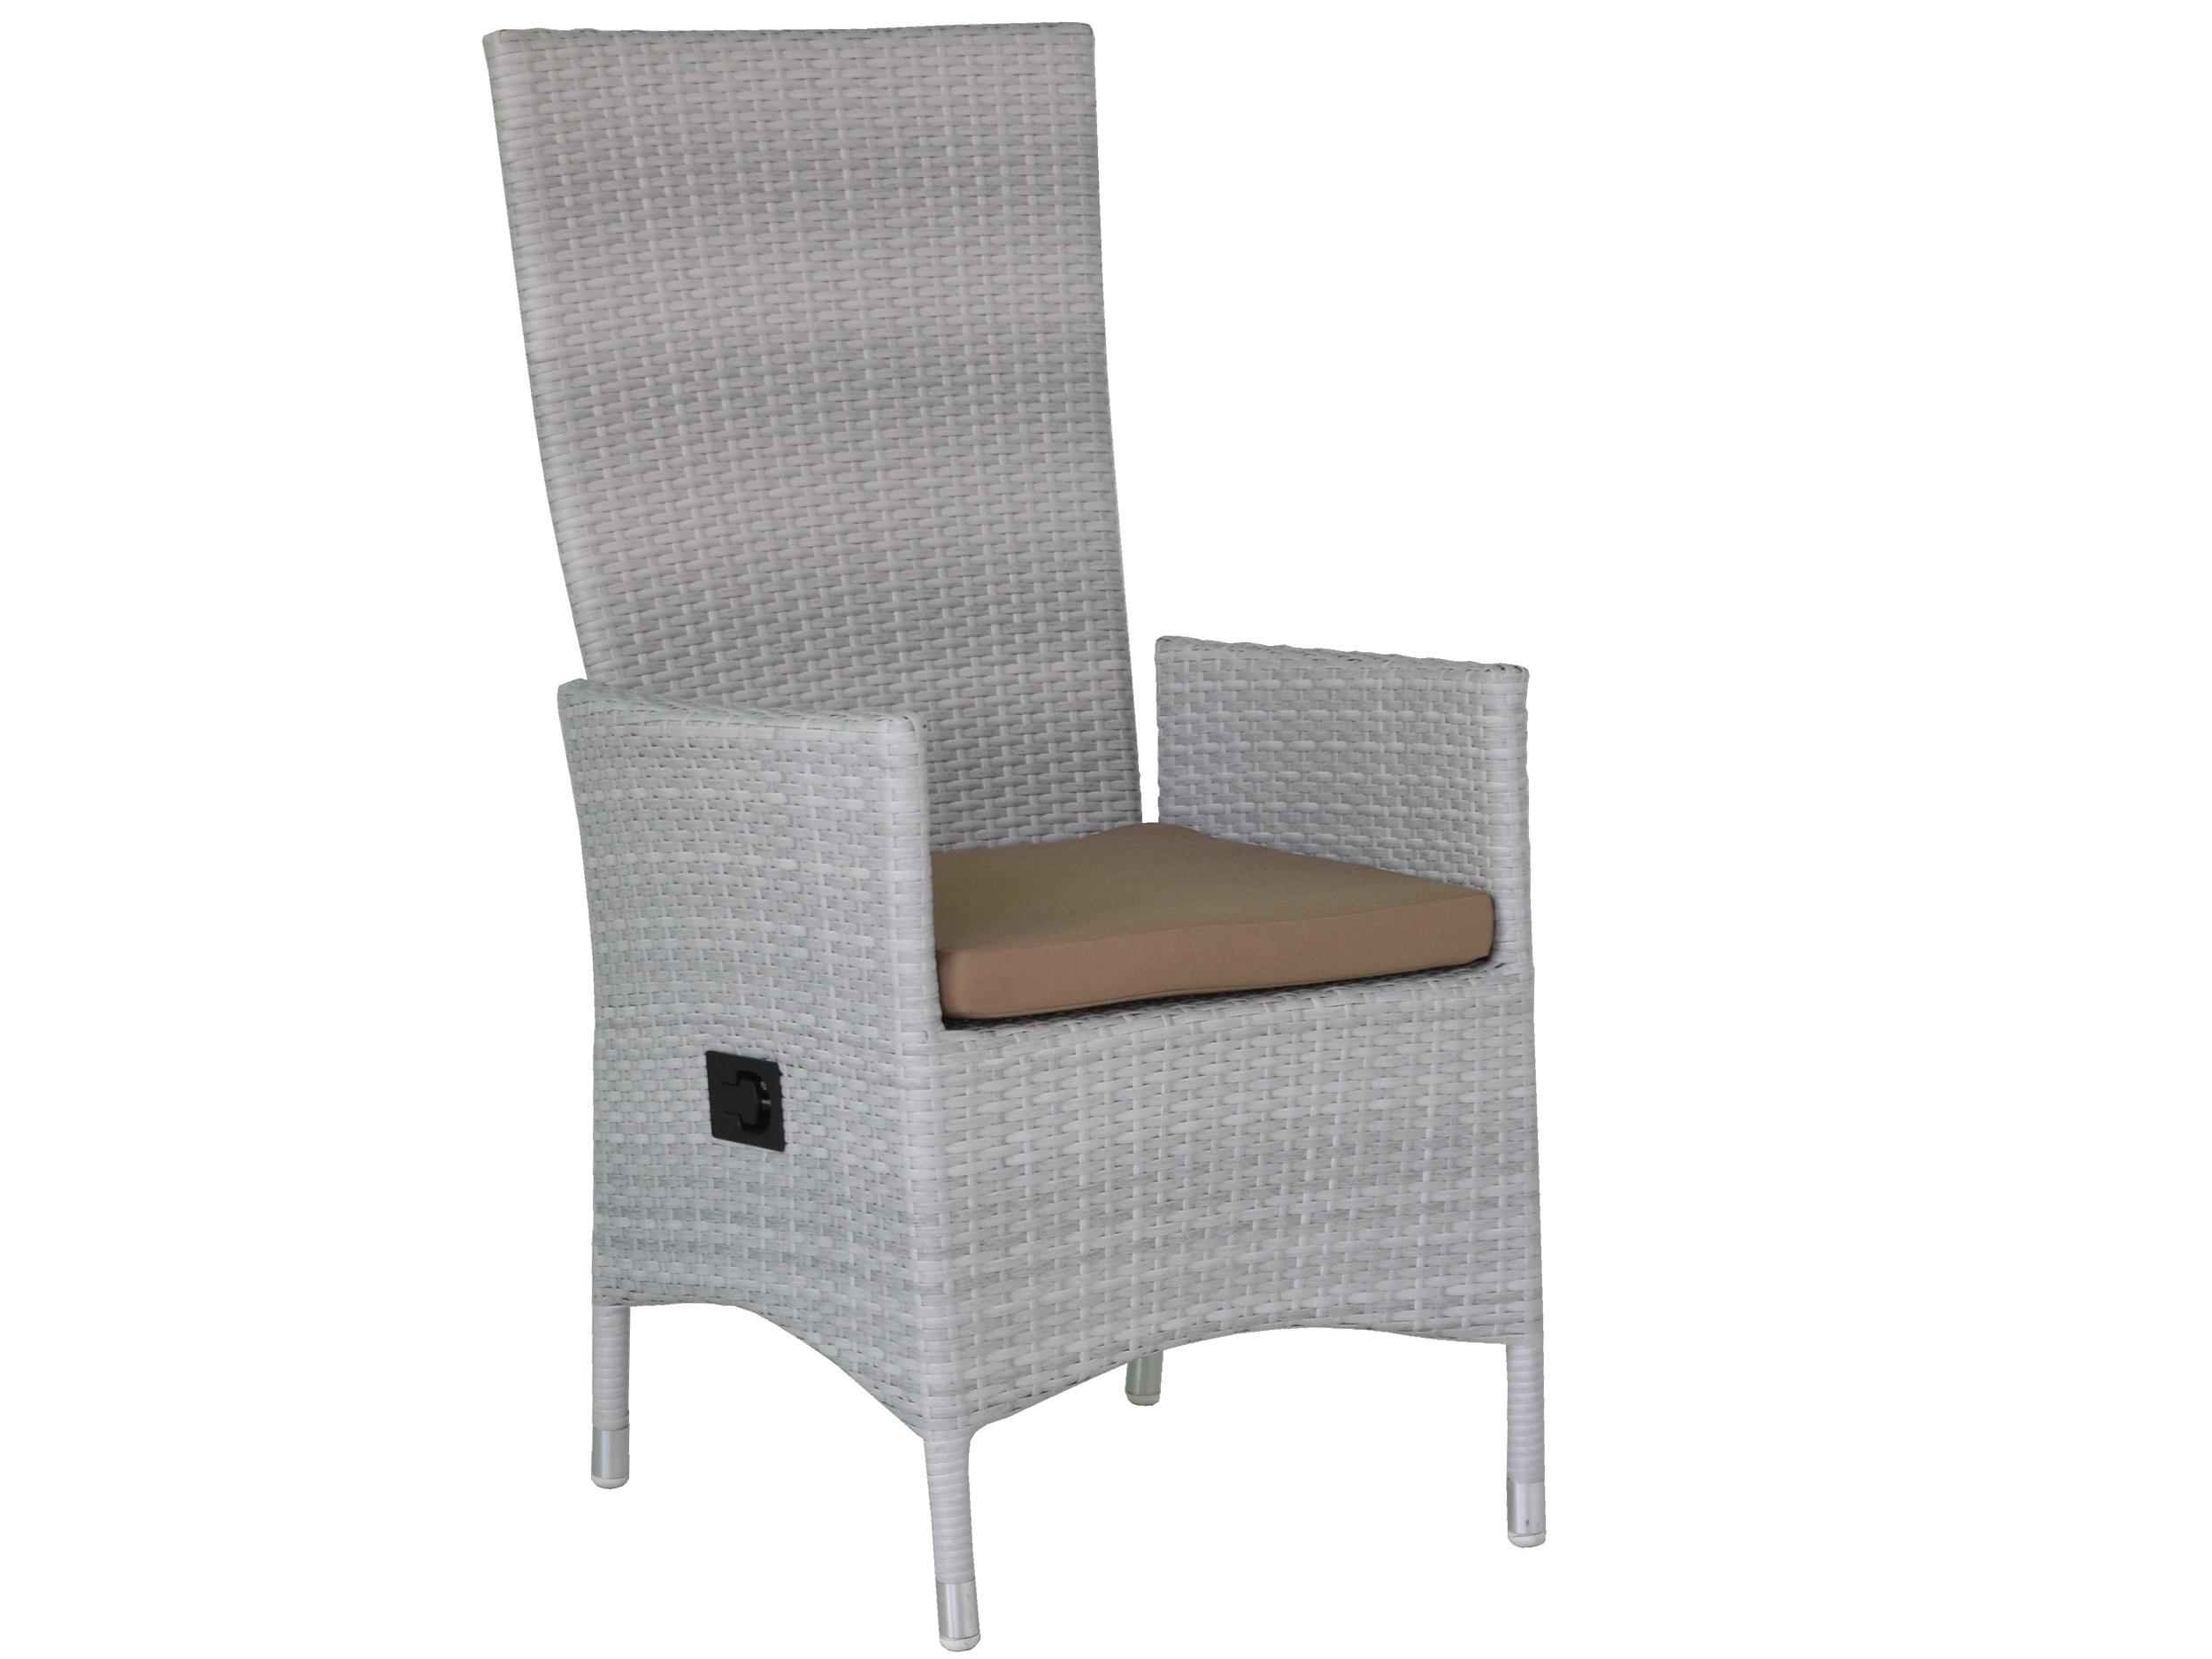 geflecht positionsessel sofia wei inkl kissen gartenm bel l nse. Black Bedroom Furniture Sets. Home Design Ideas